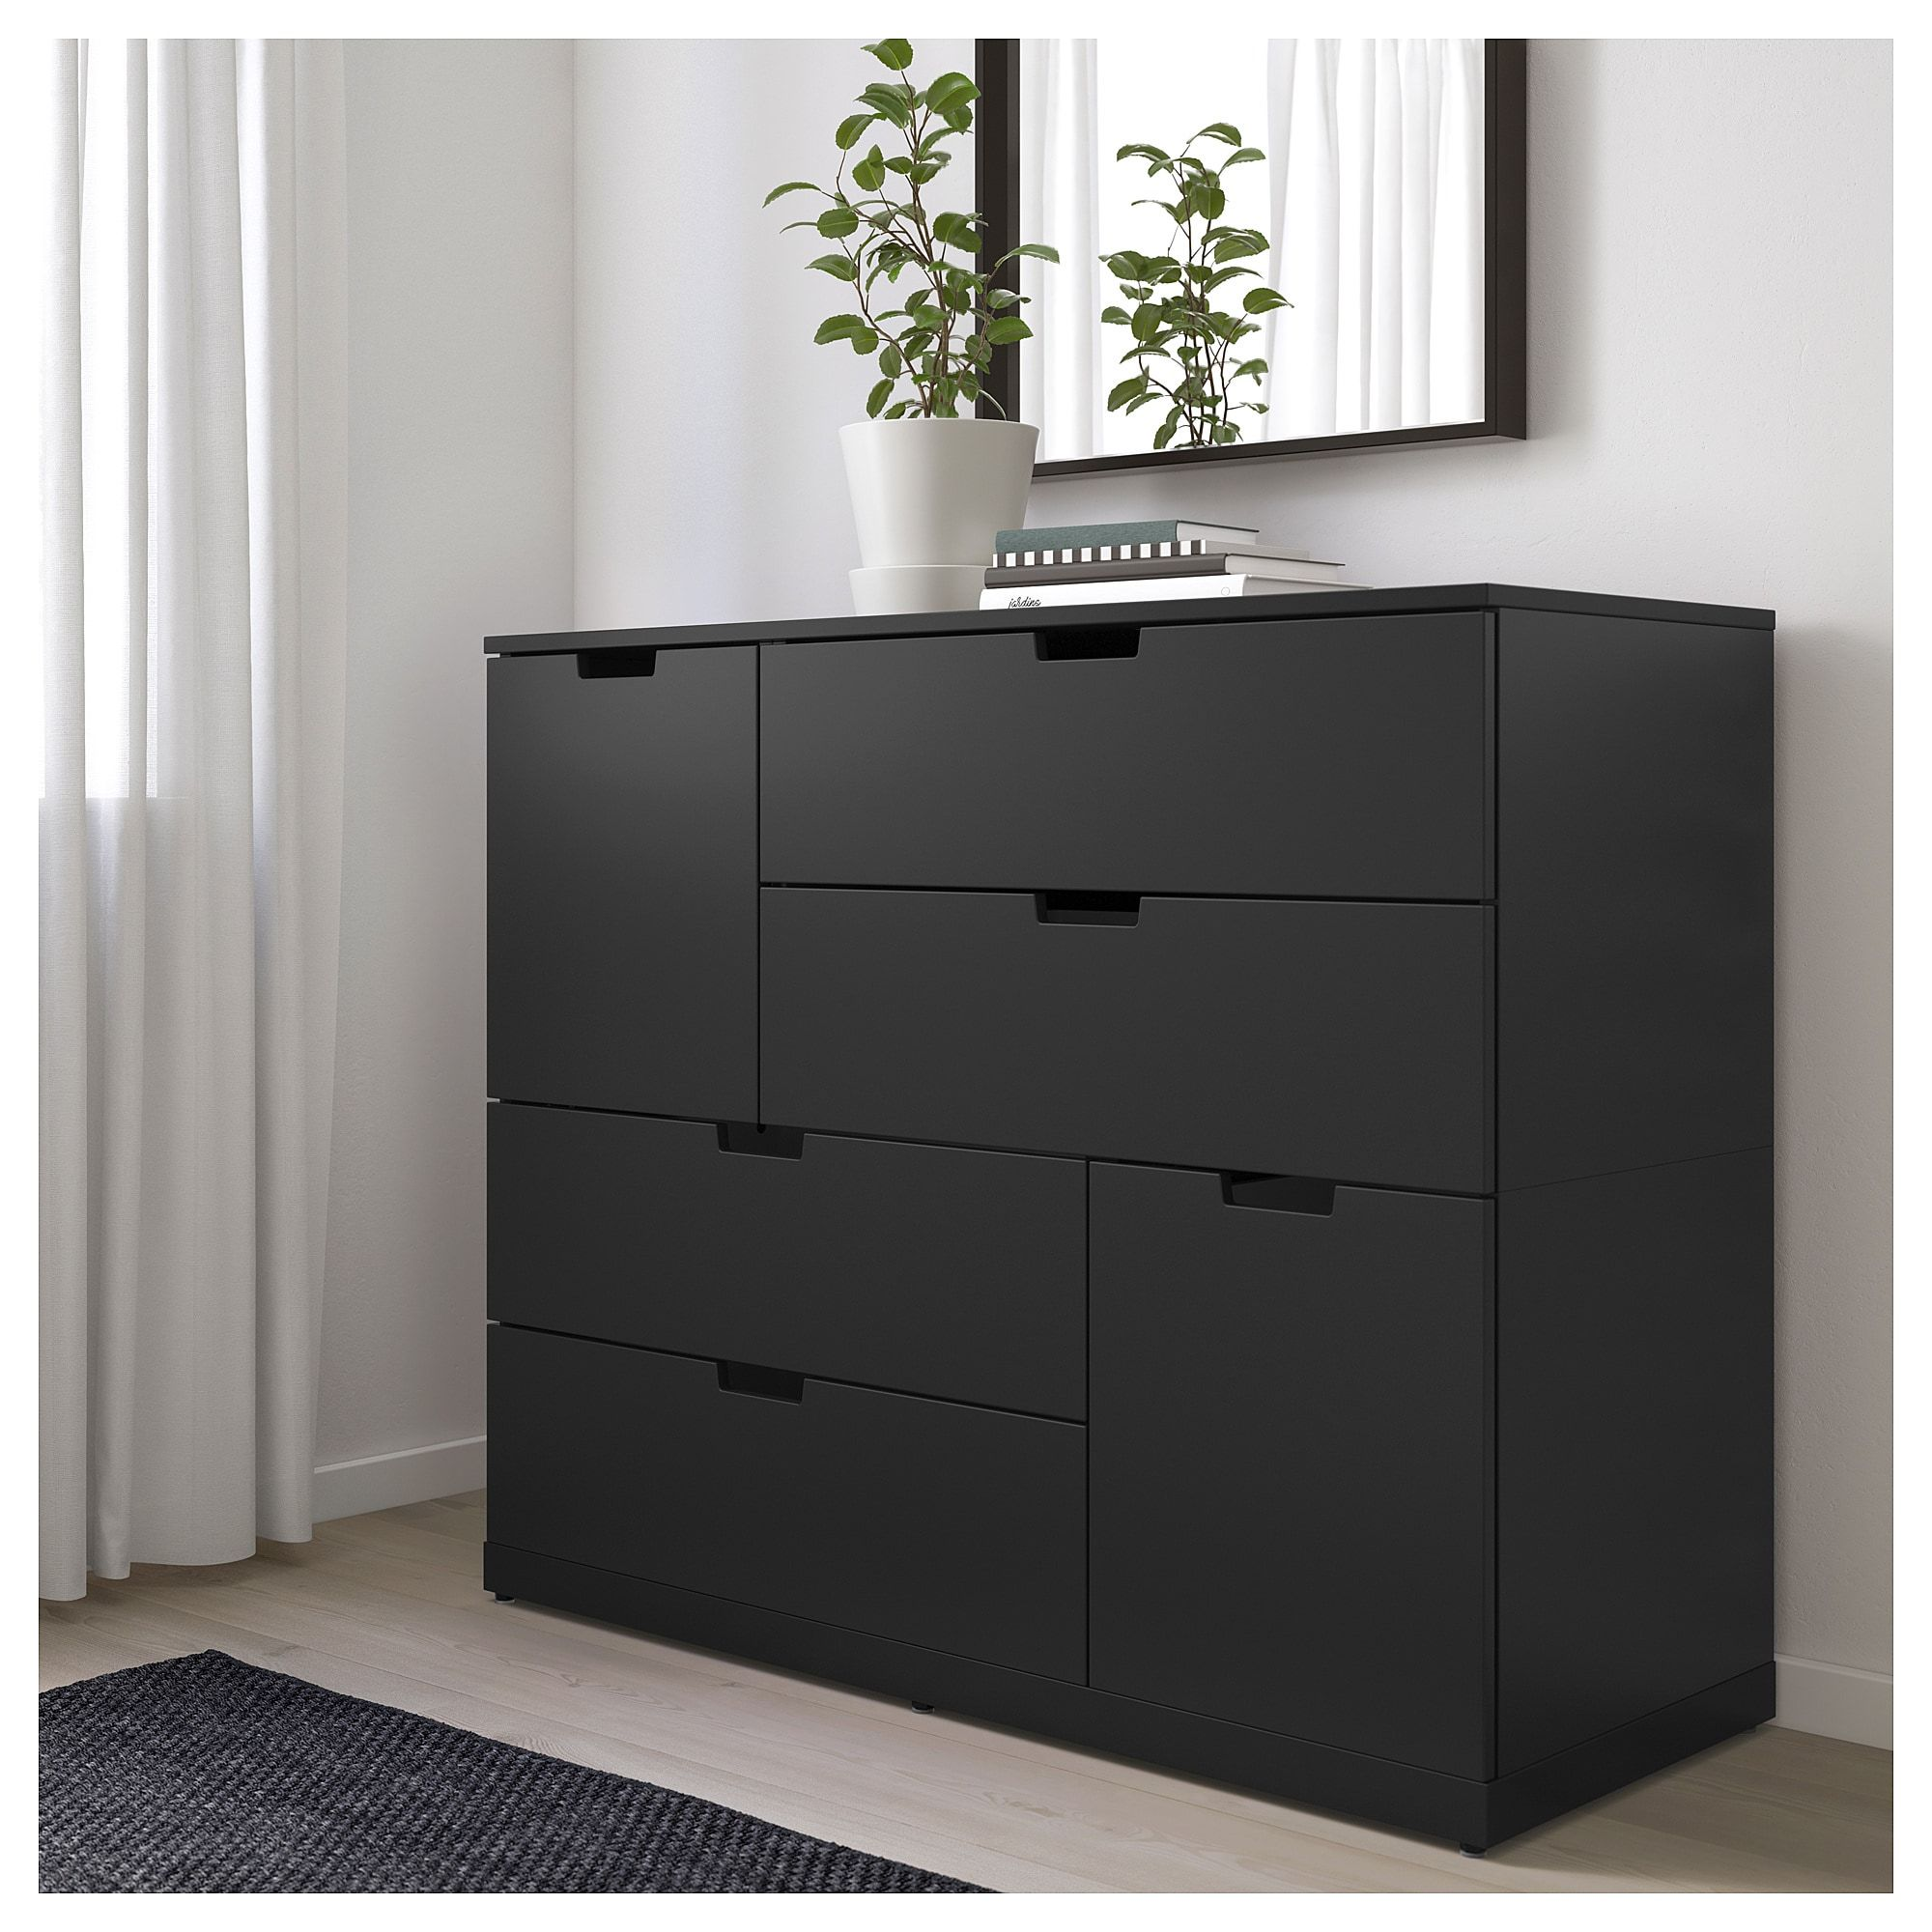 Products Dresser Drawers Ikea Nordli Black Dresser Bedroom [ 2000 x 2000 Pixel ]